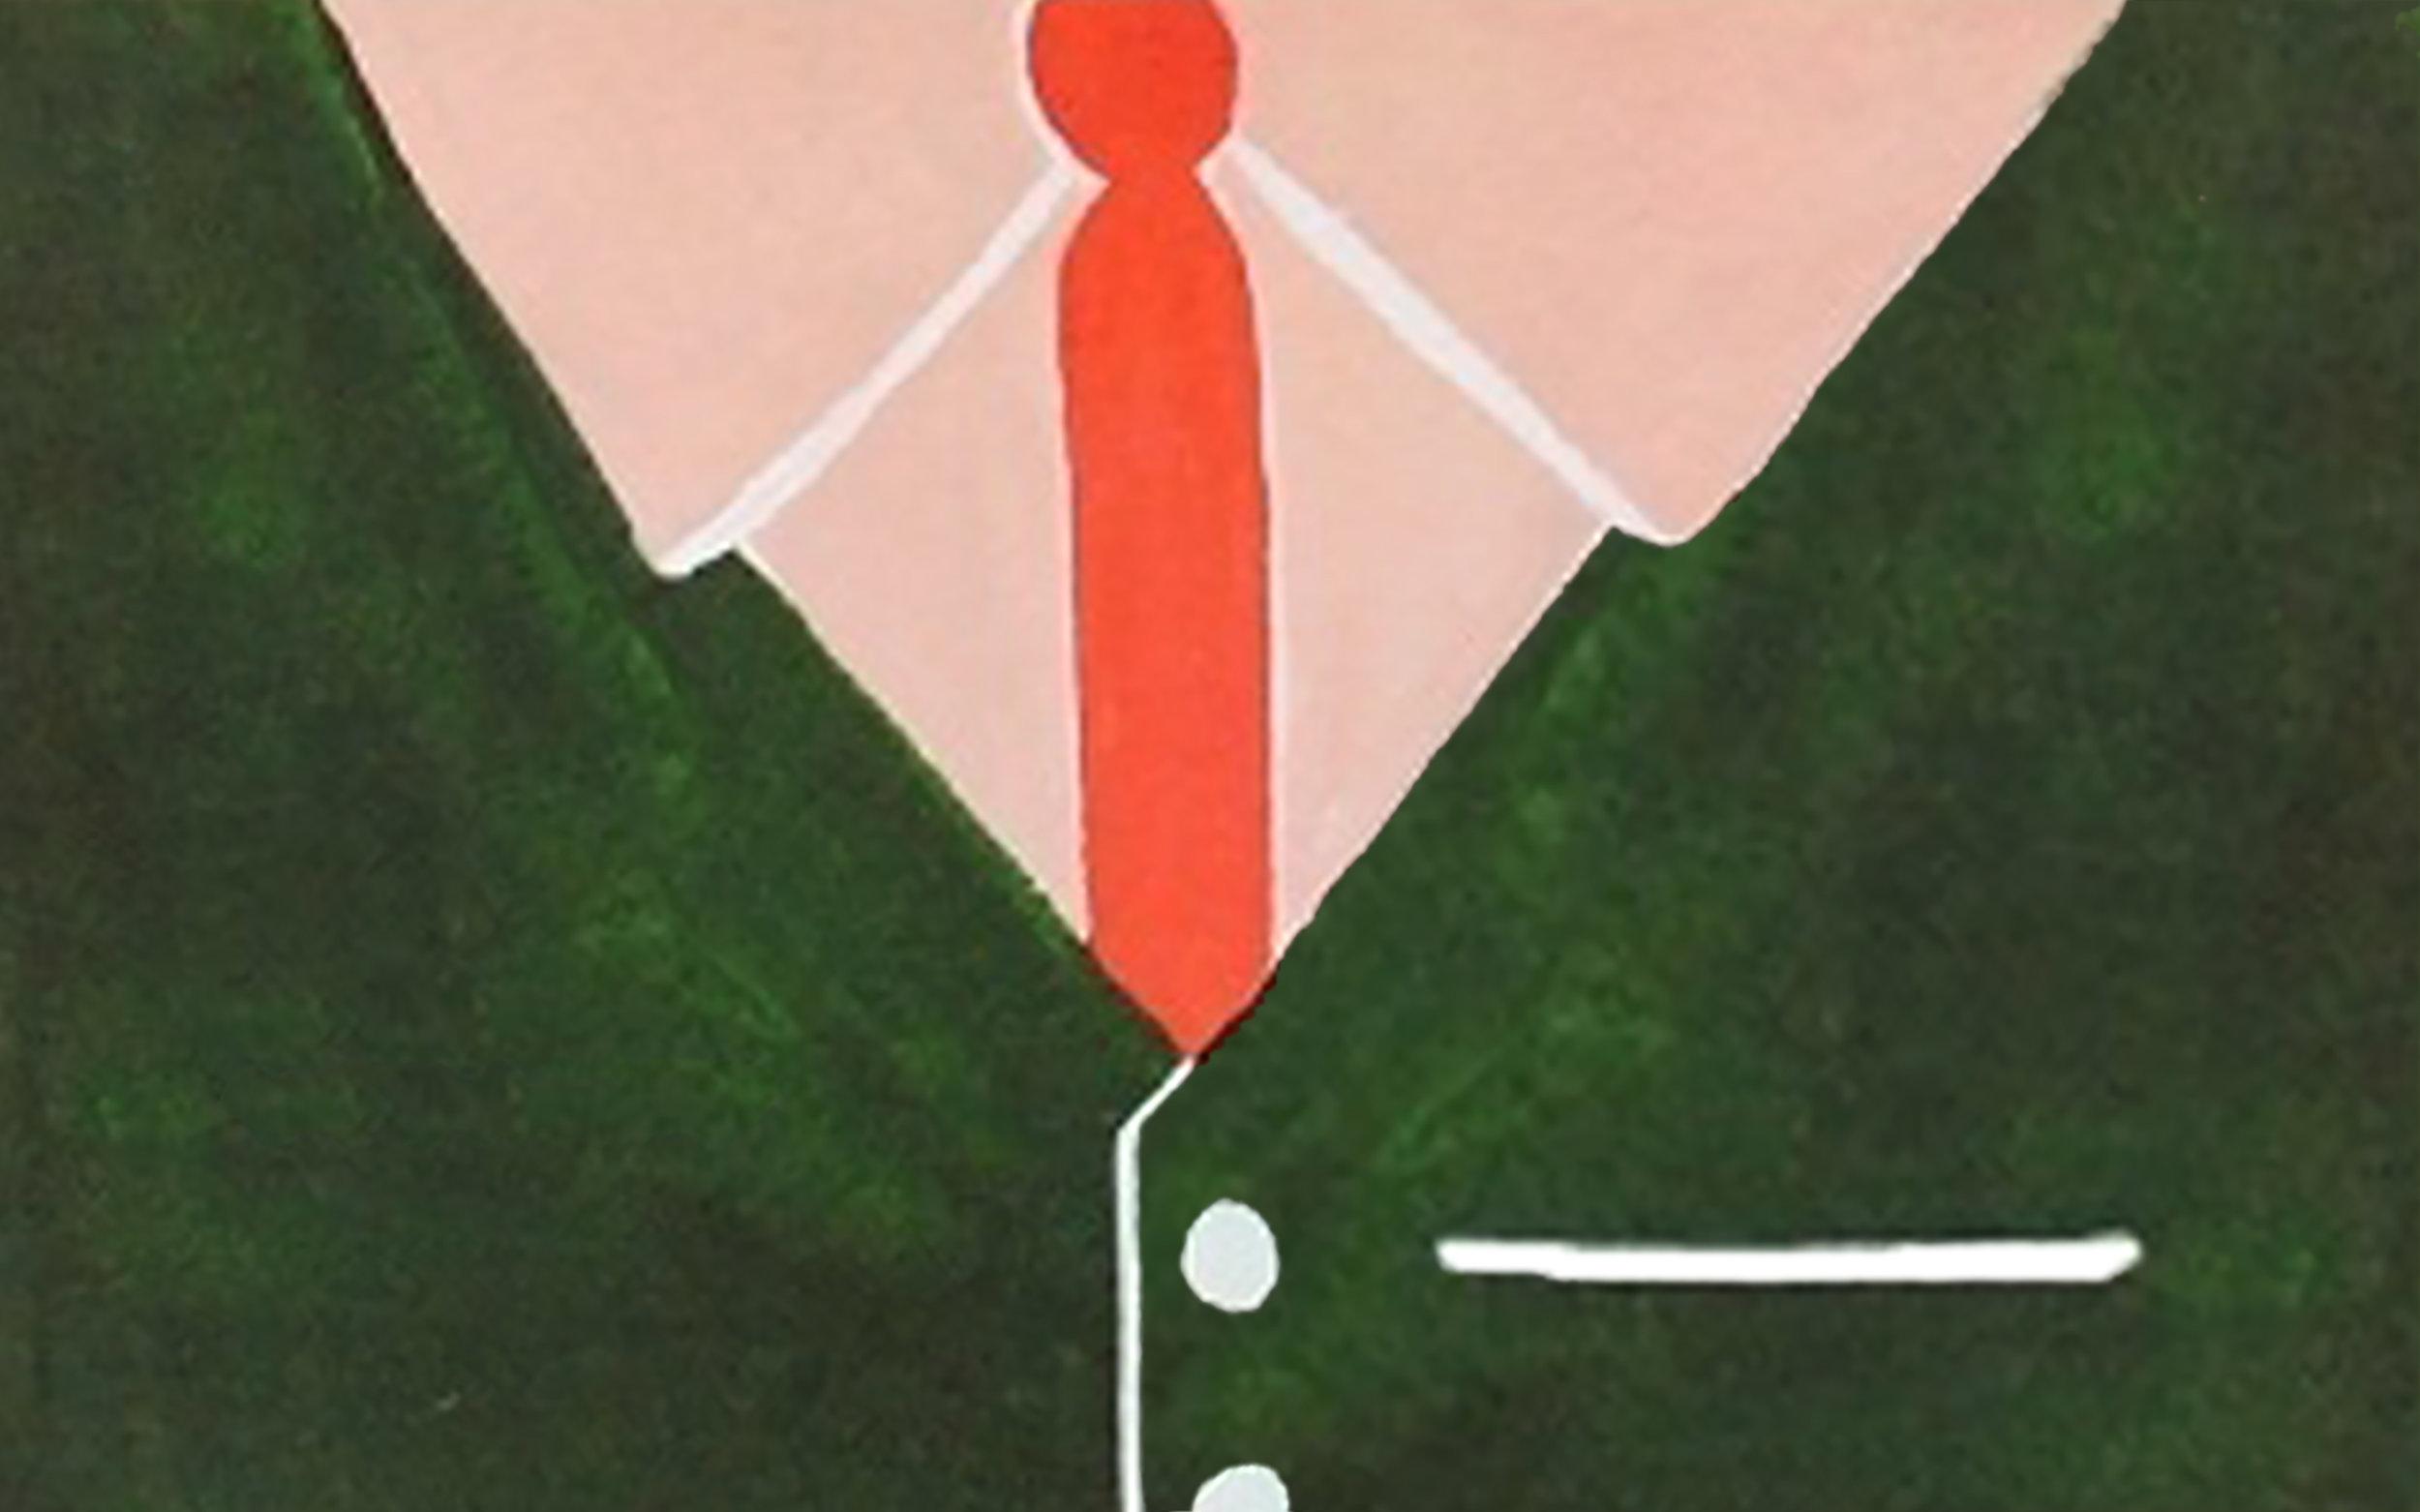 La cravate - Frenzy - Cultur'club